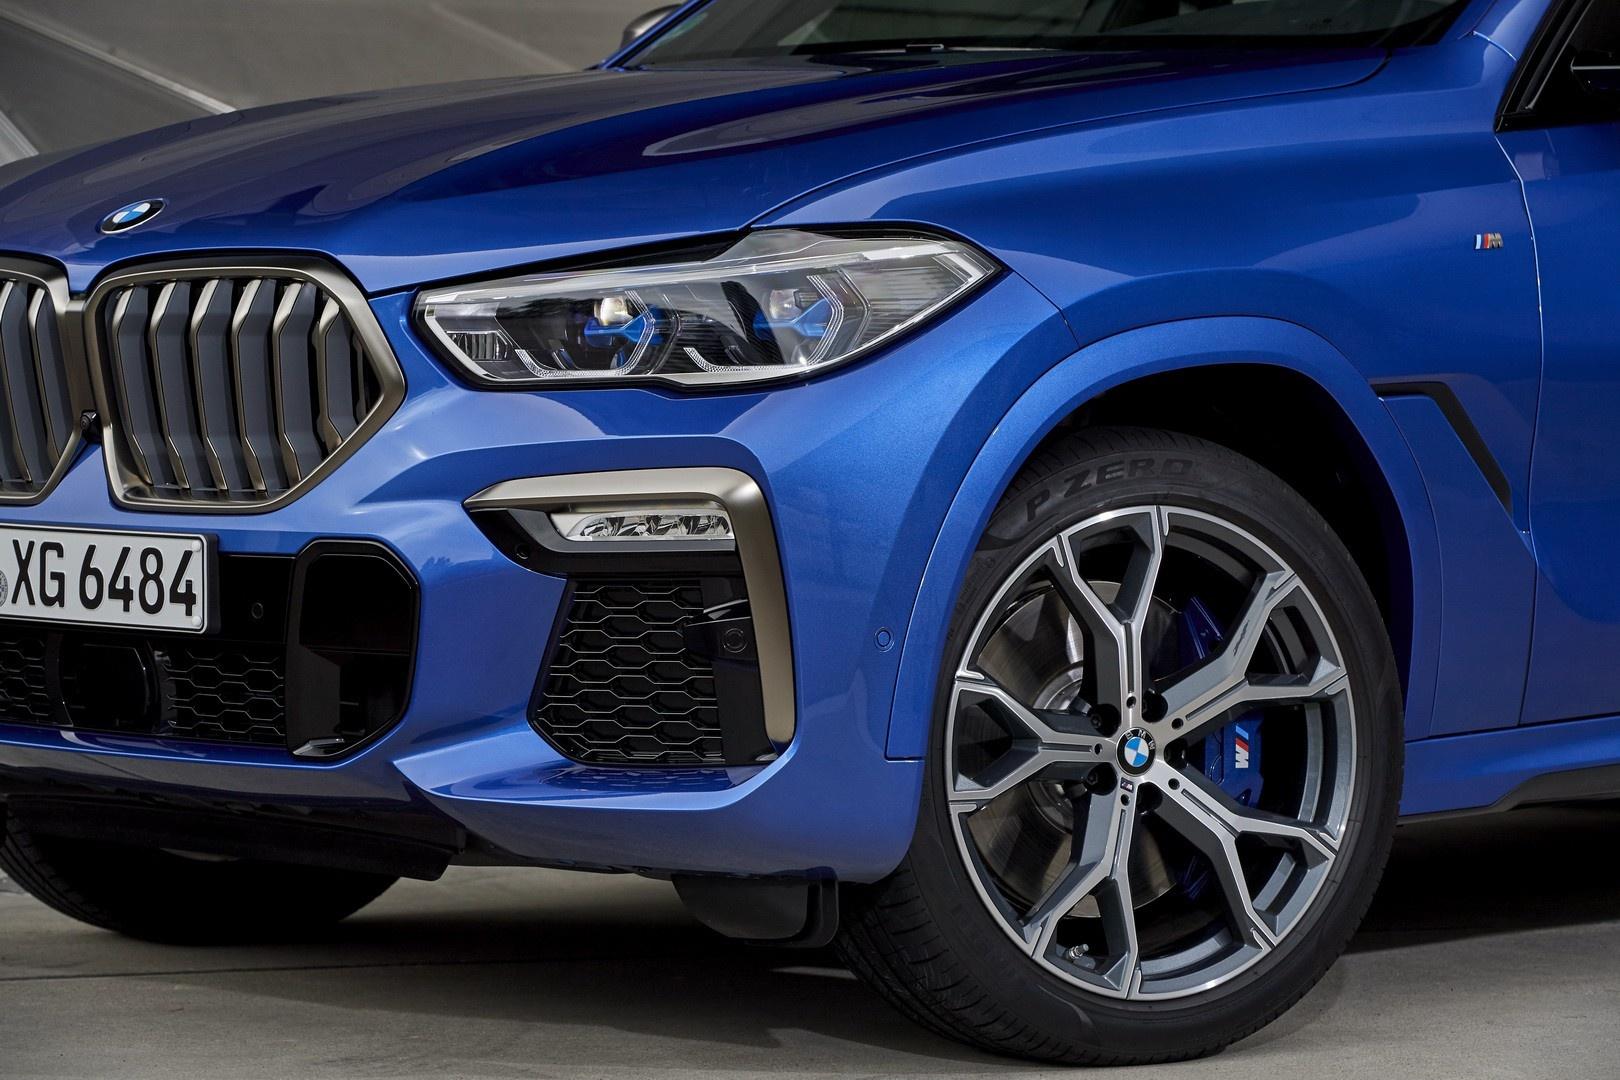 BMW X6 2020 - SUV voi suc manh sieu xe hinh anh 12